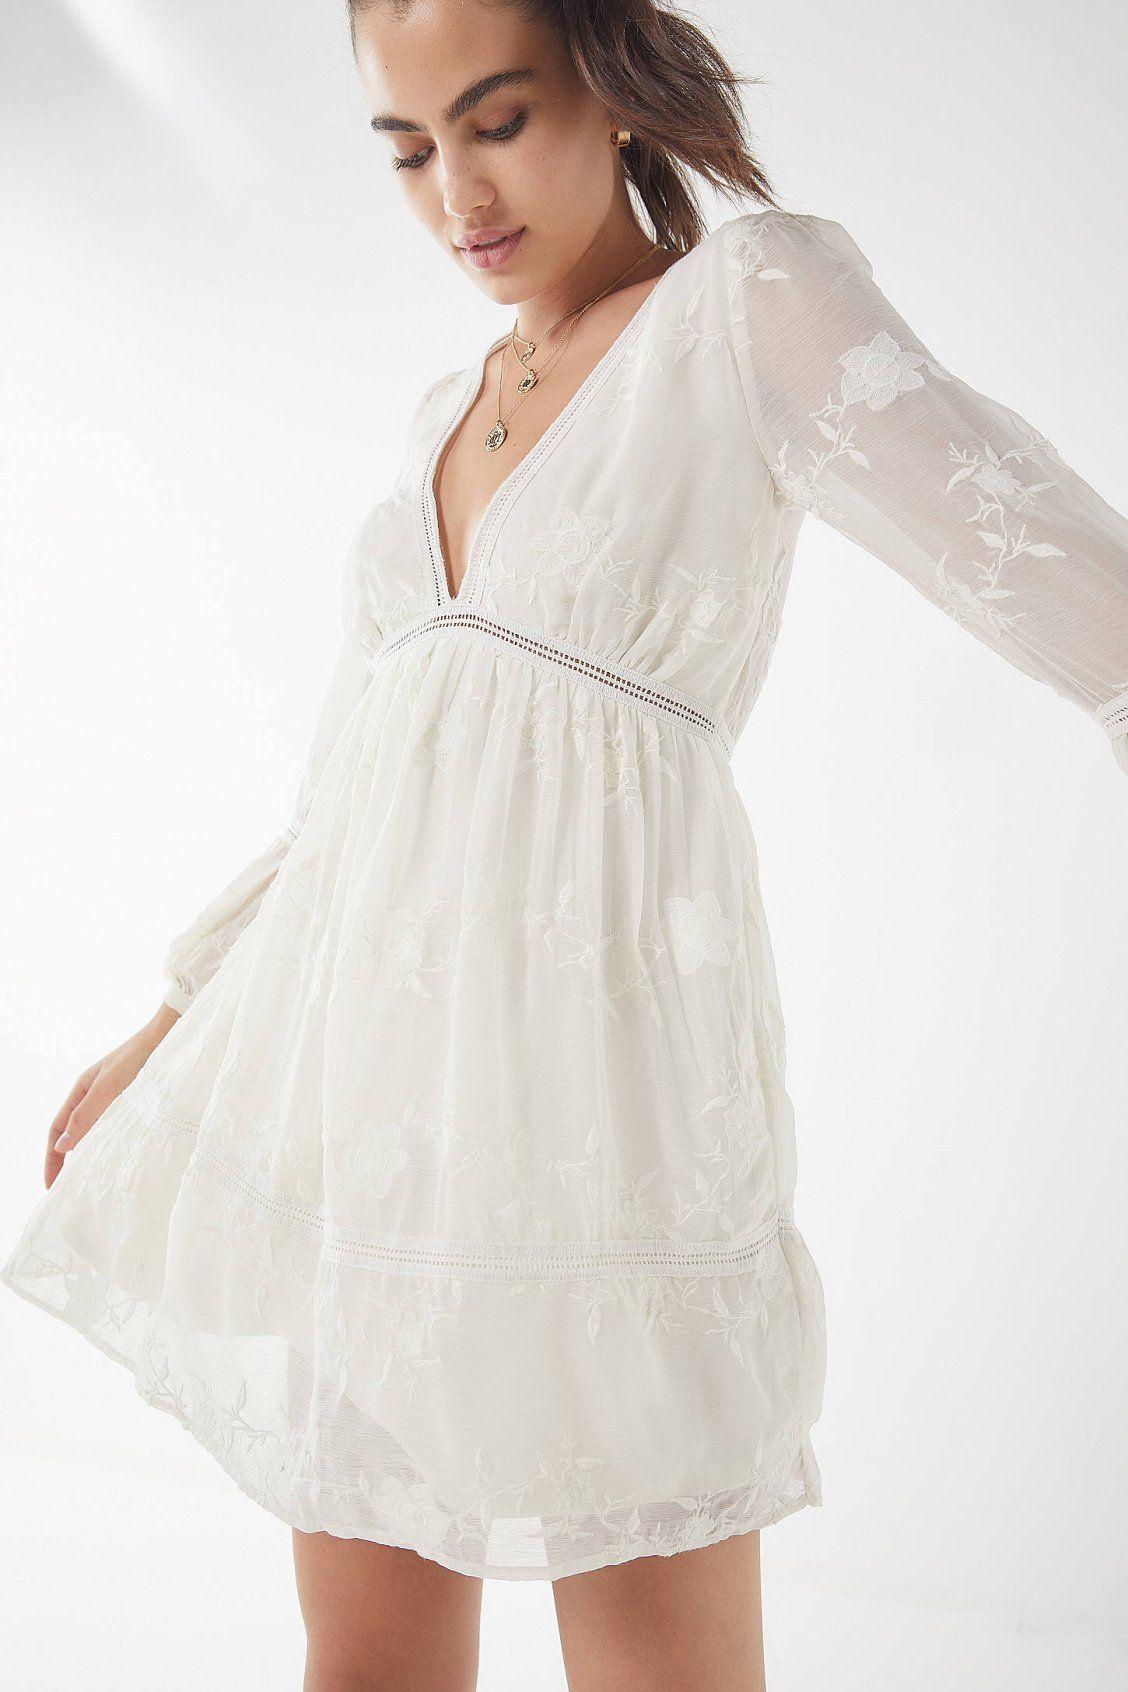 76566fcab2 UO Clara Embroidered Empire-Waist Dress in 2019